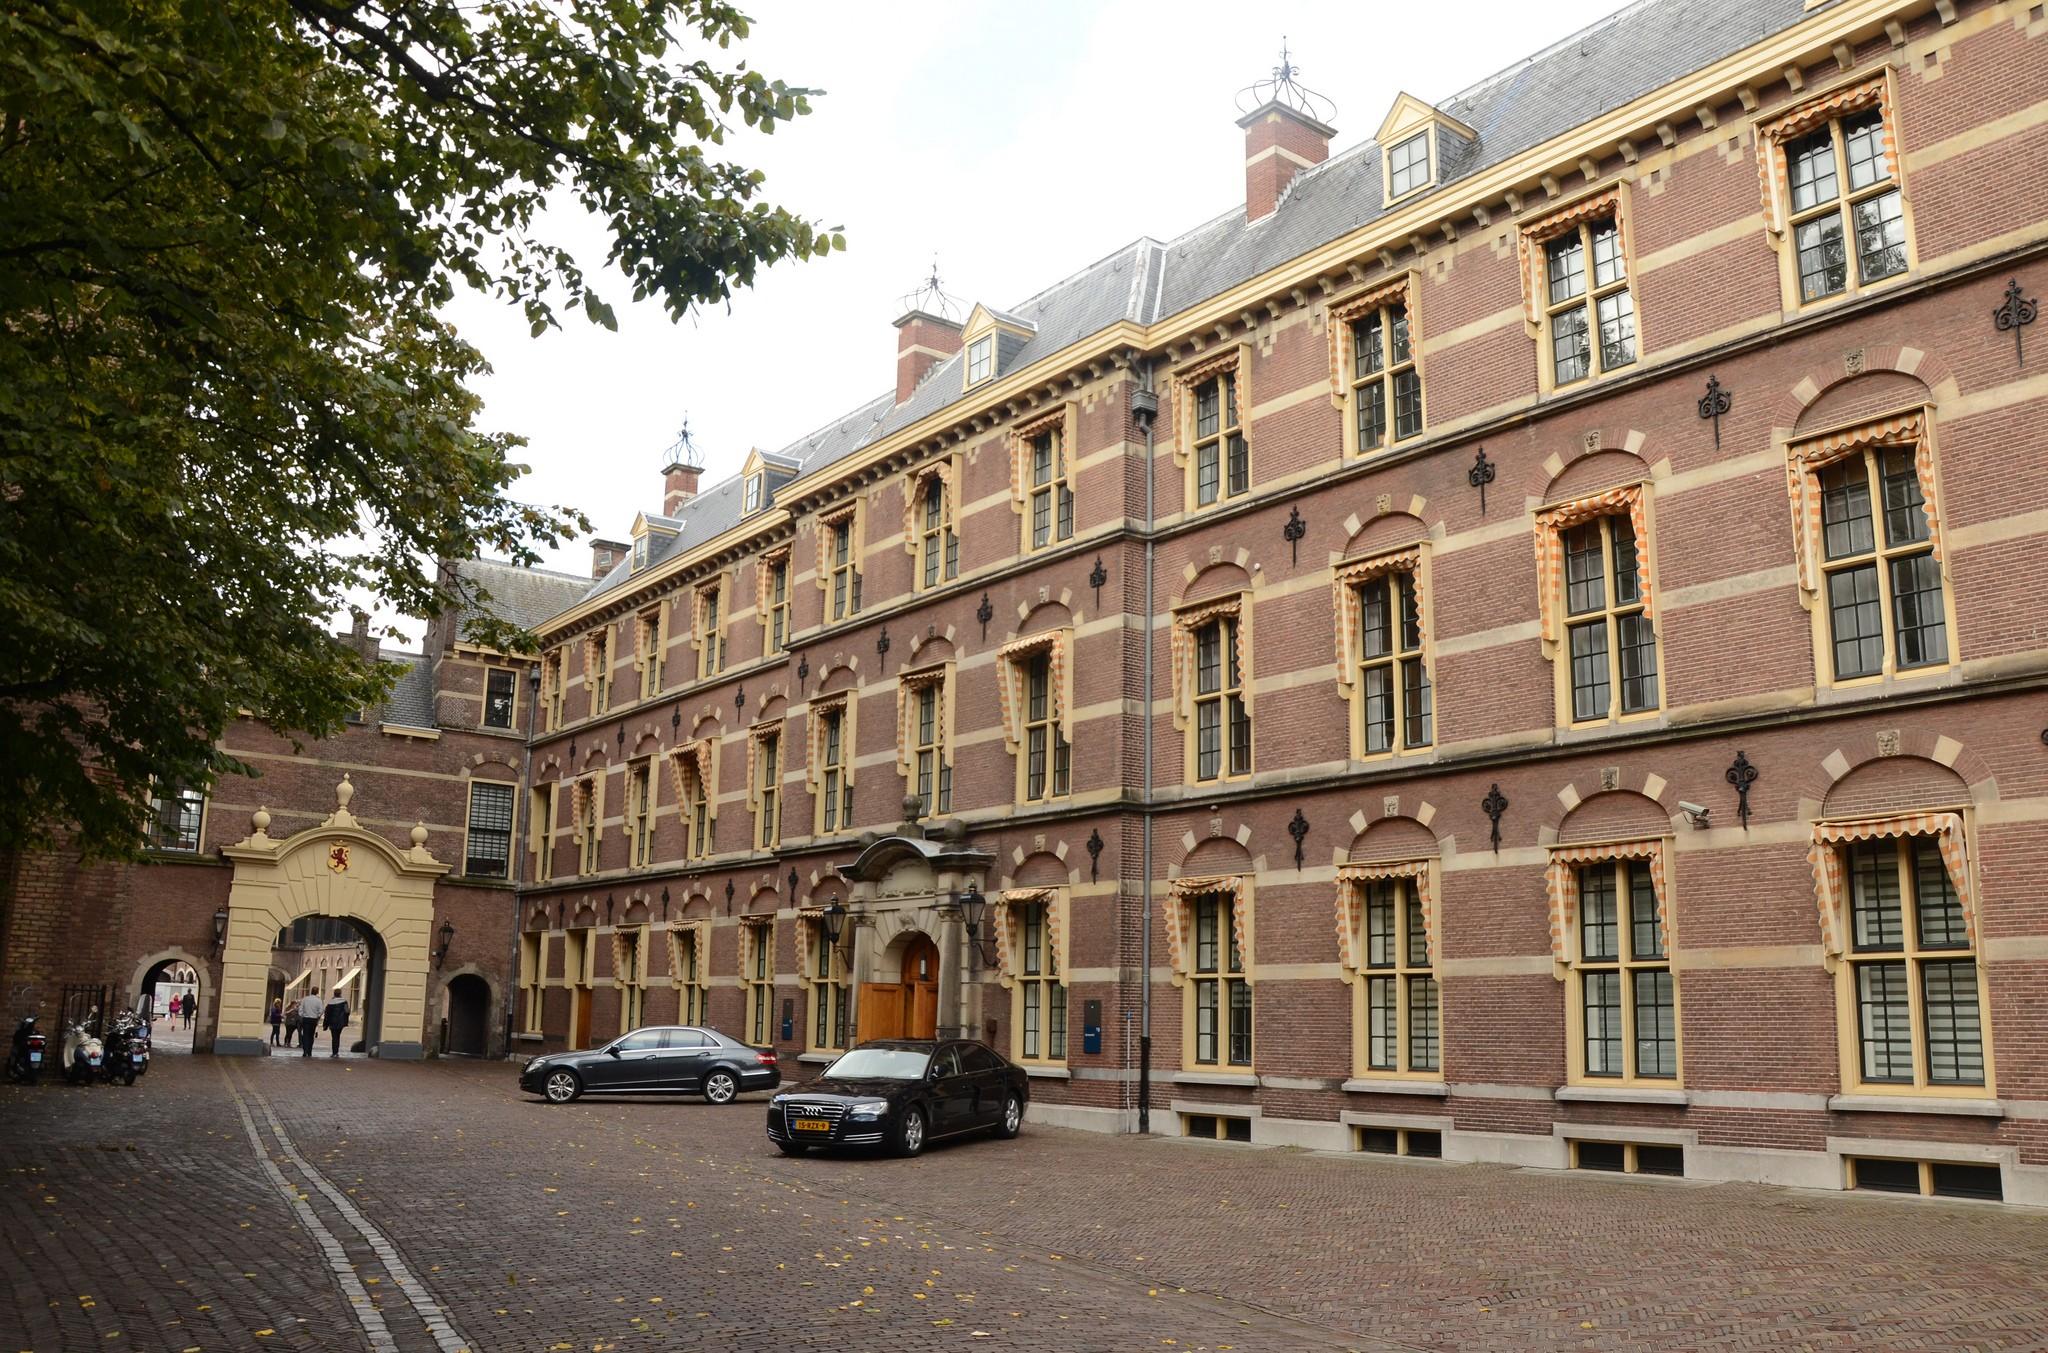 Binnenhof Eerste Kamer Tweede Kamer Den Haag